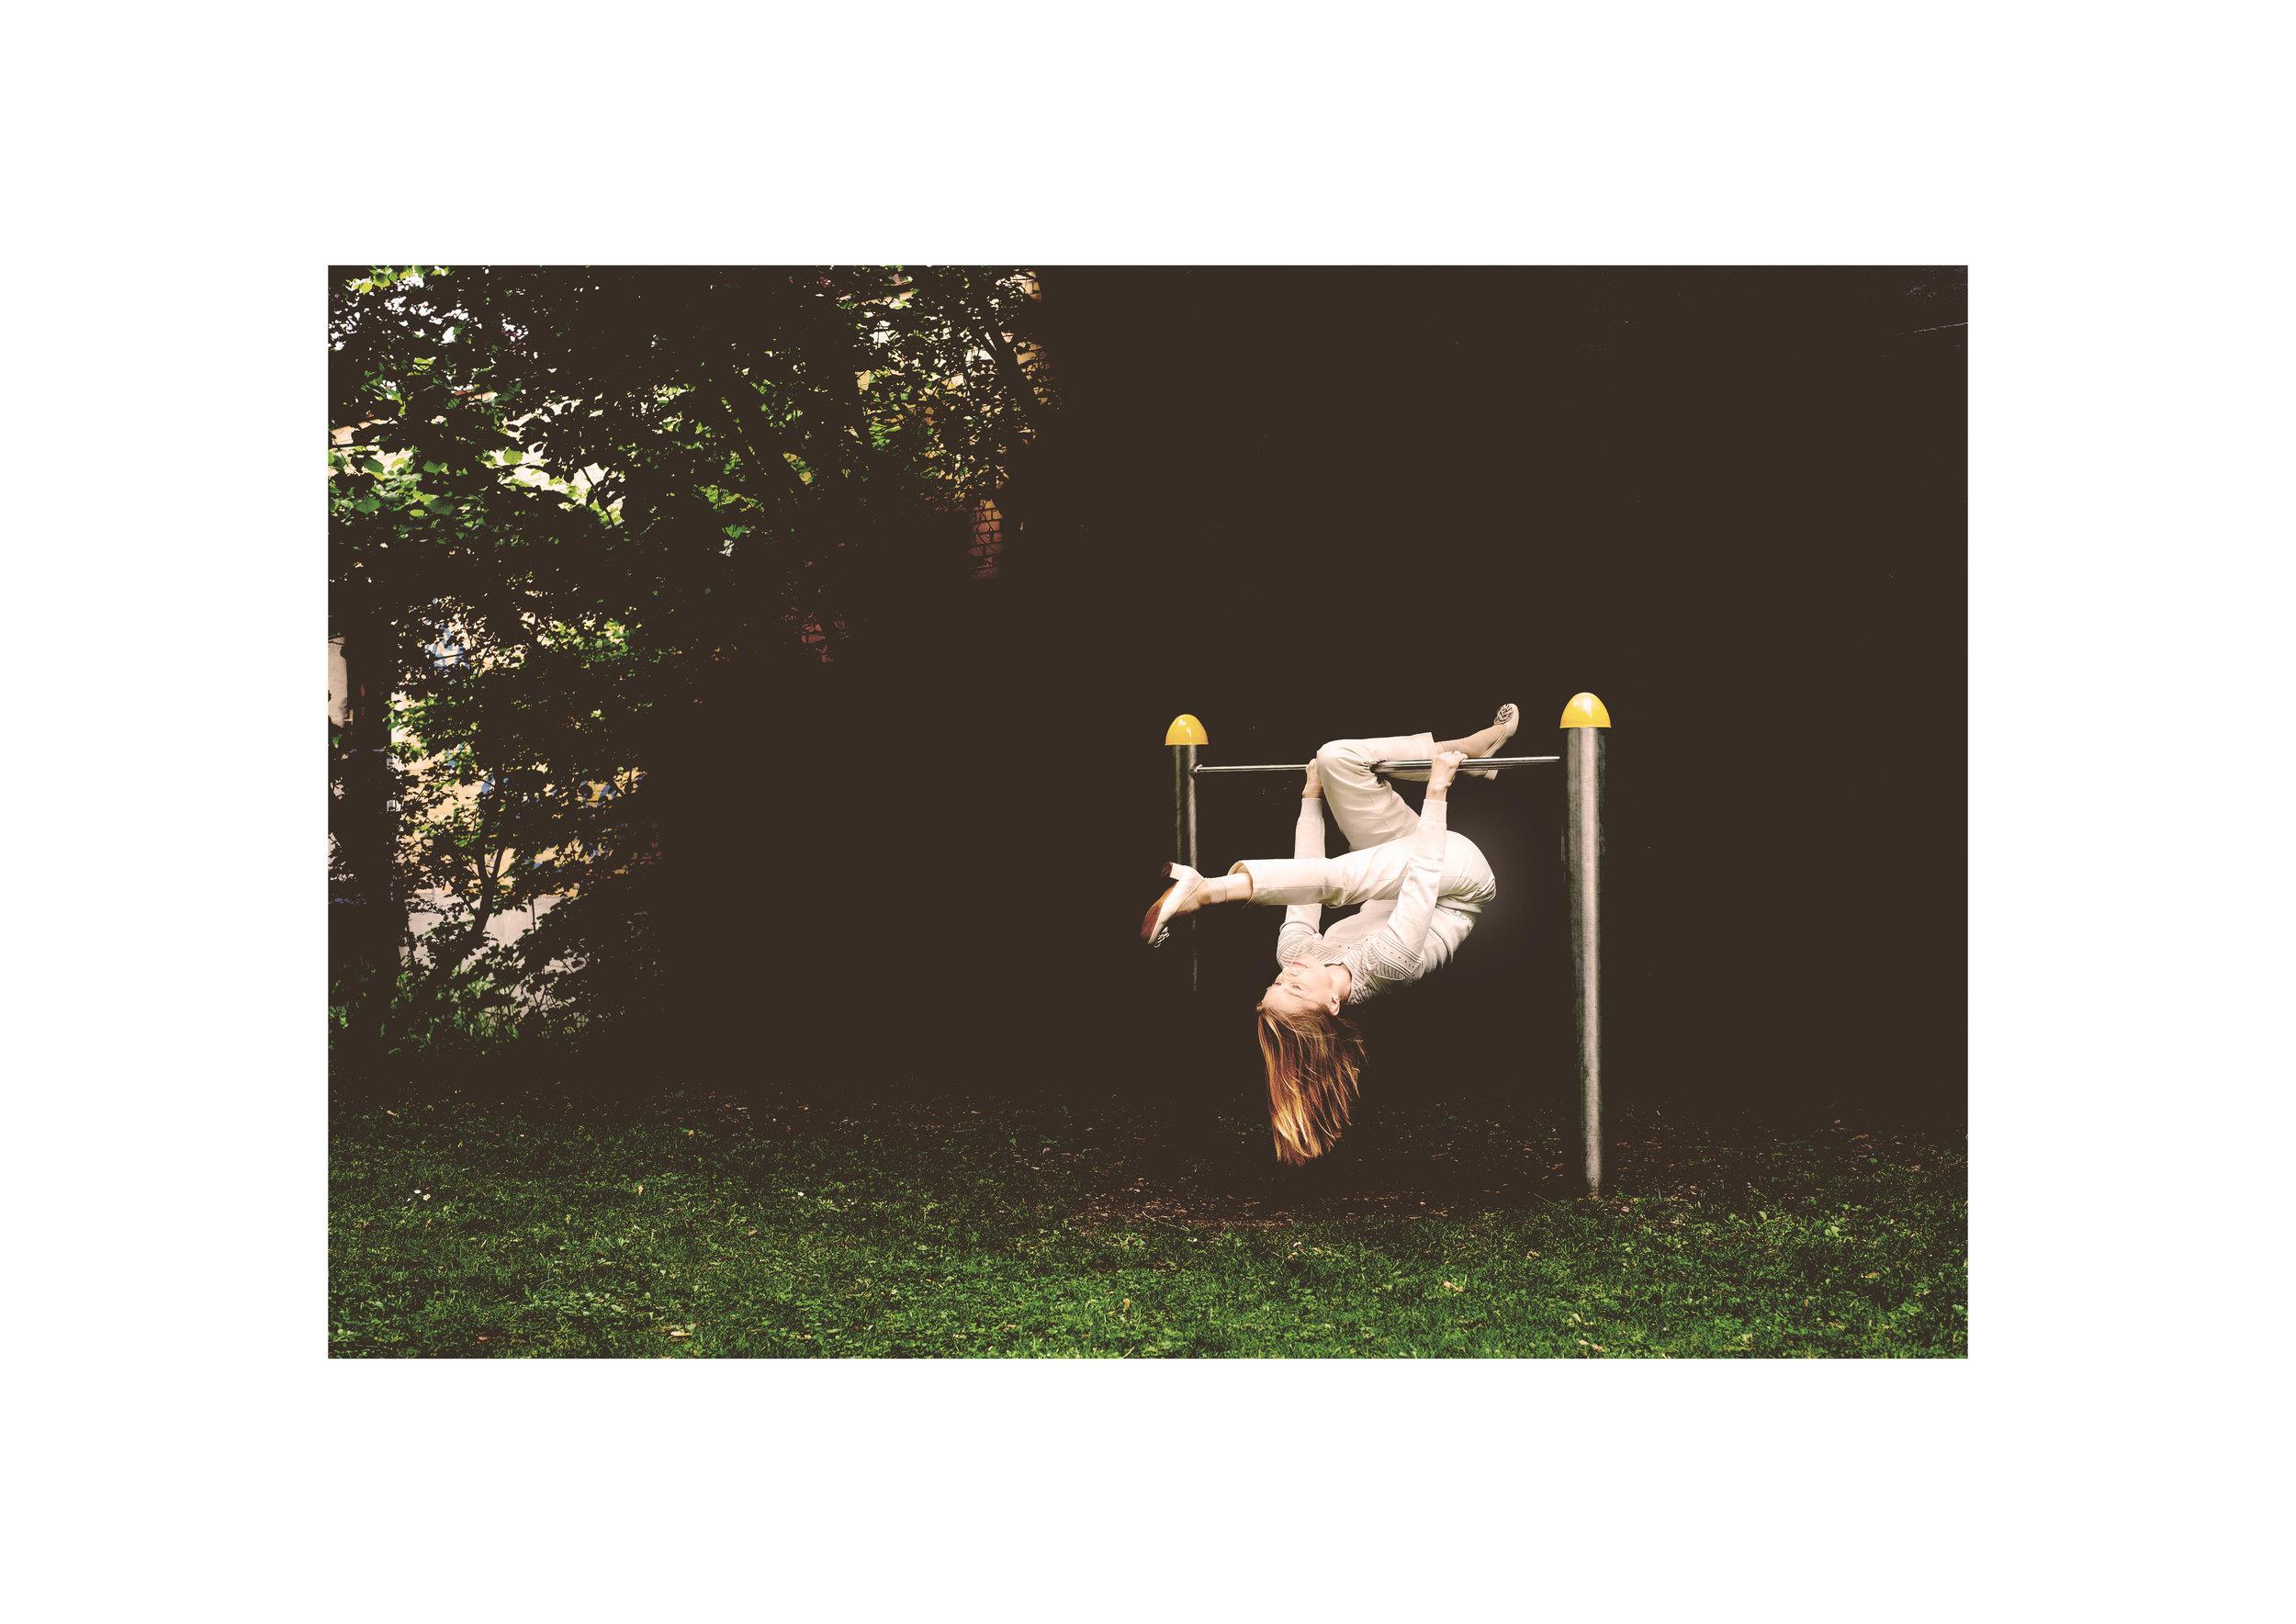 Levitationhanging.jpg